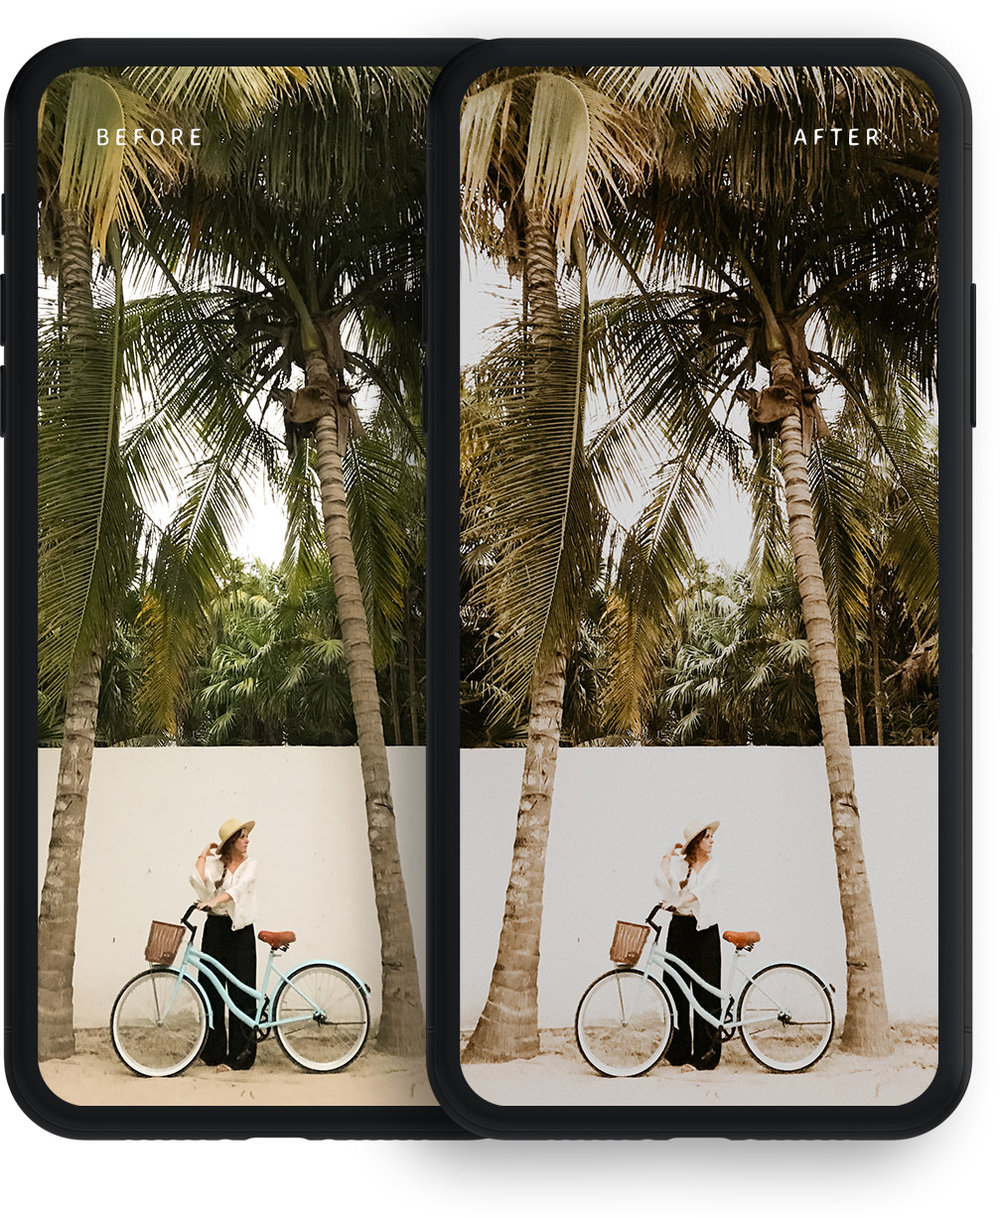 lightroom-mobile-phone-presets-4.jpg